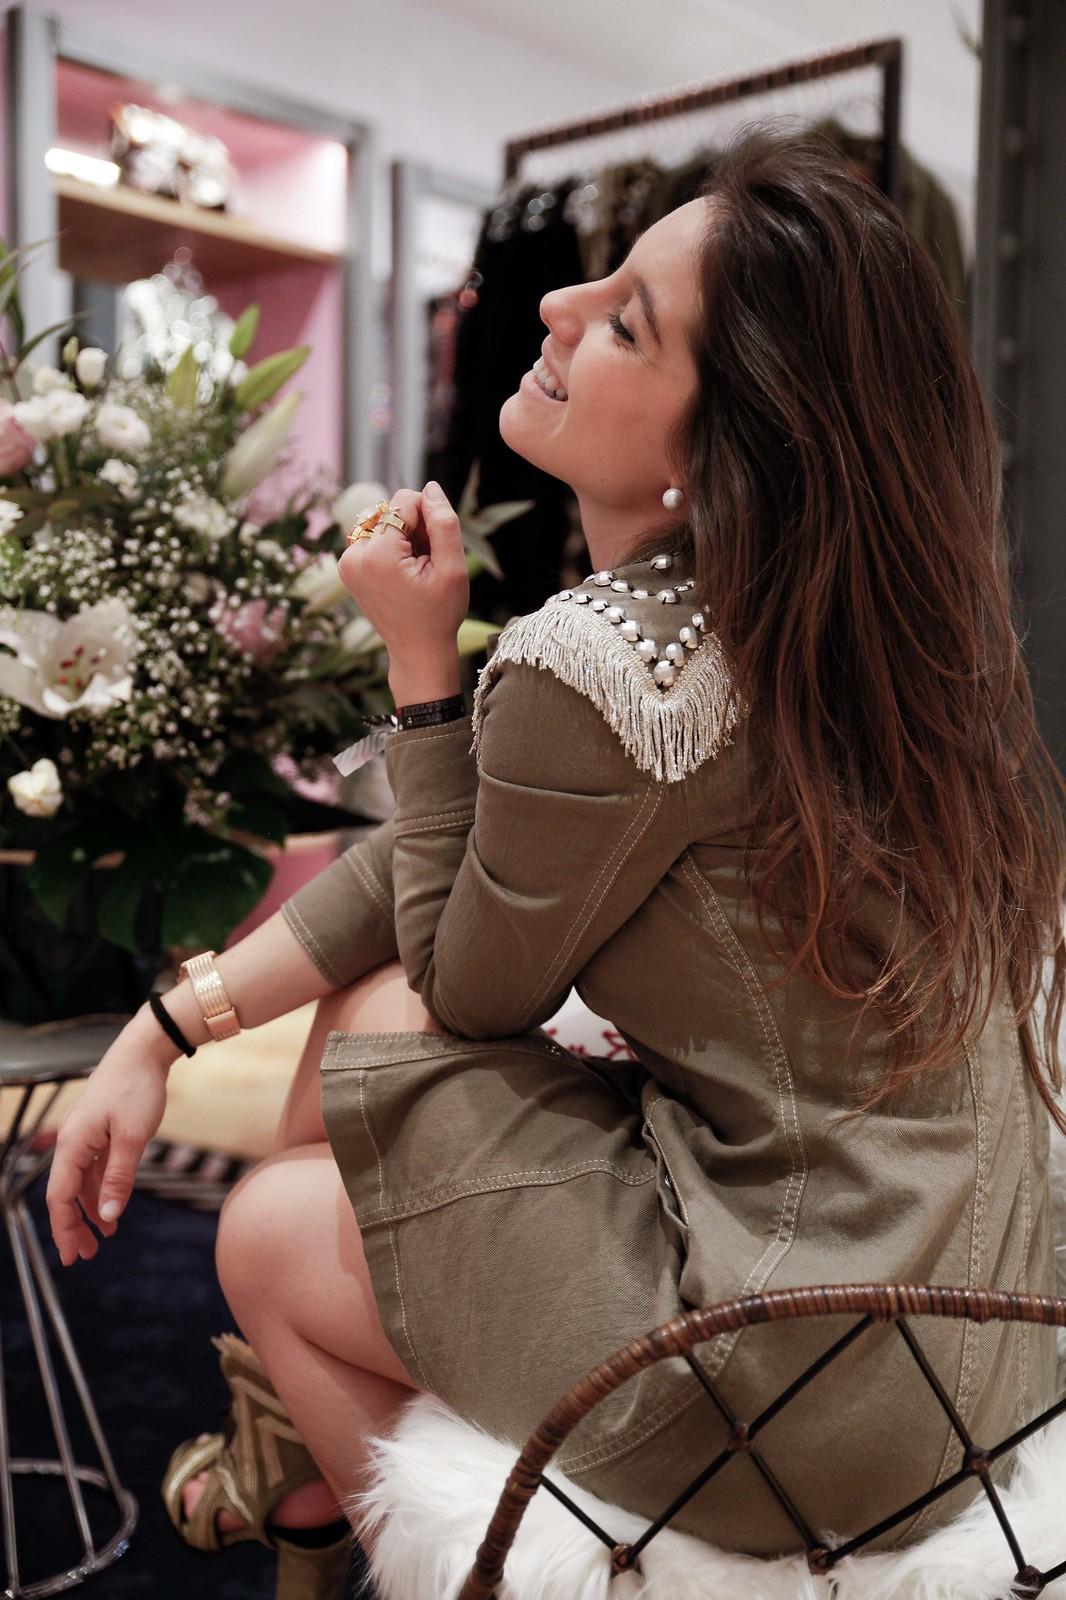 01_Highly_Preppy_abre_su_primera_tienda_en_Bilbao_influencers_fashion_lifestyle_theguestgirl_look_military_khaki_ootd